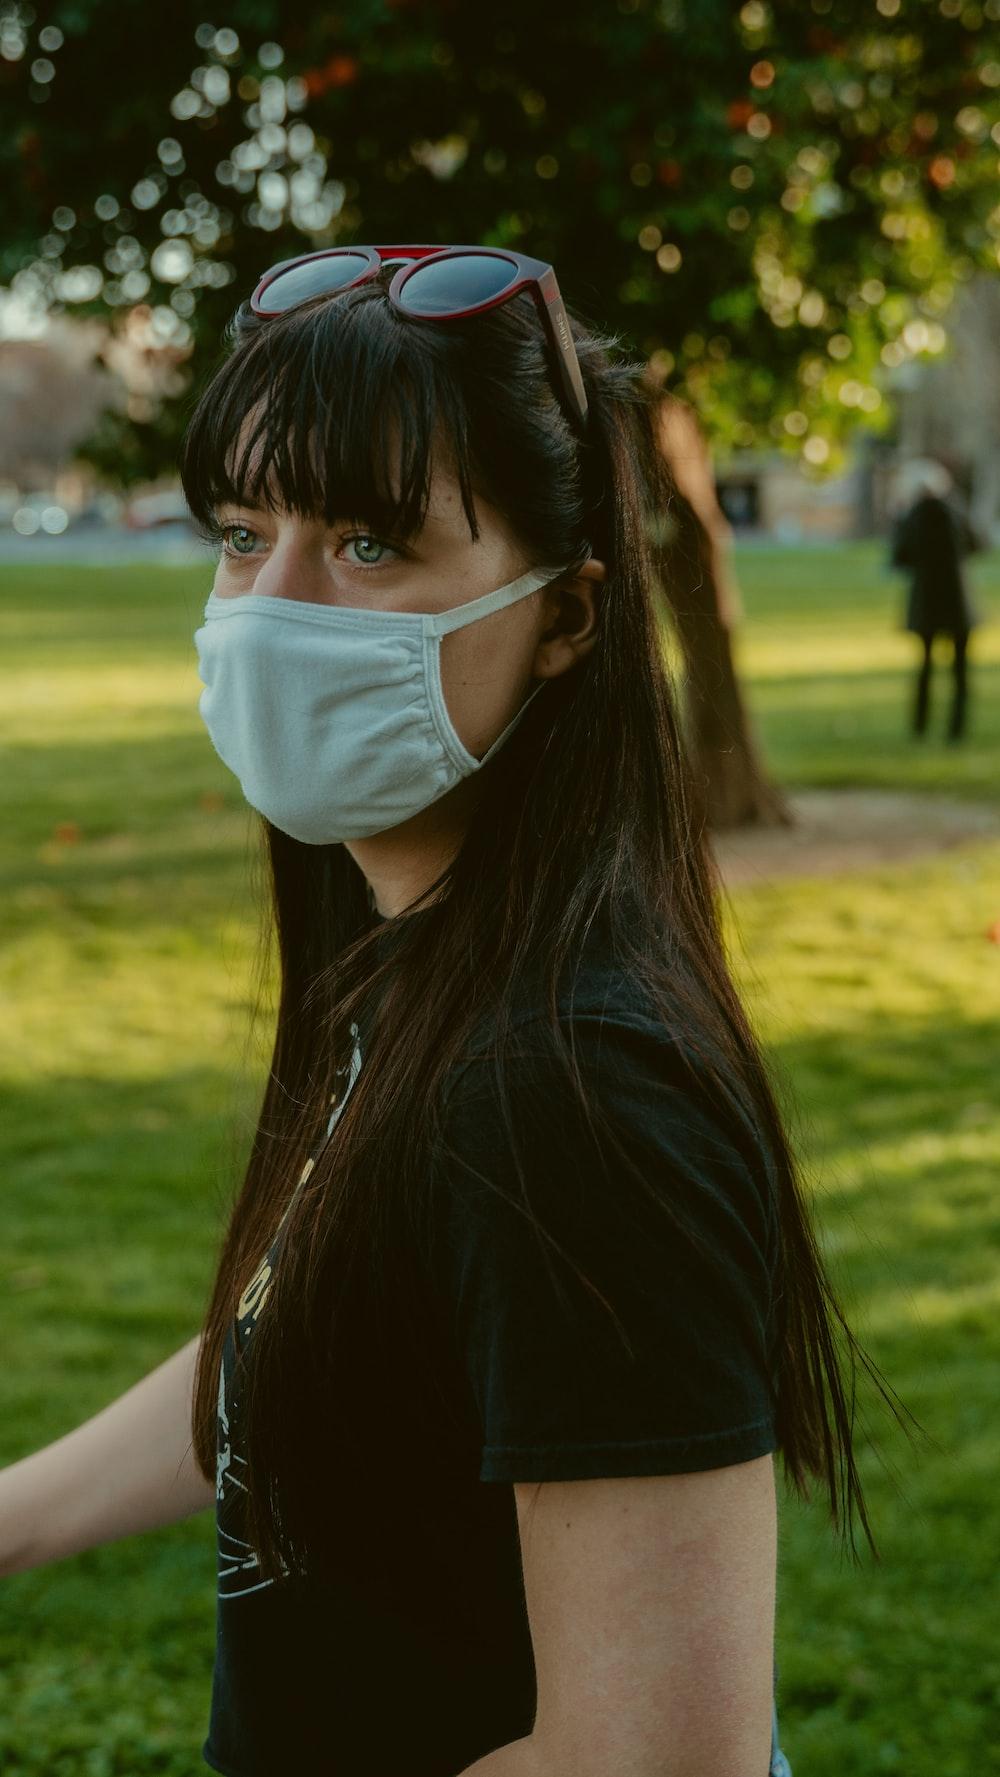 woman in black shirt wearing white face mask